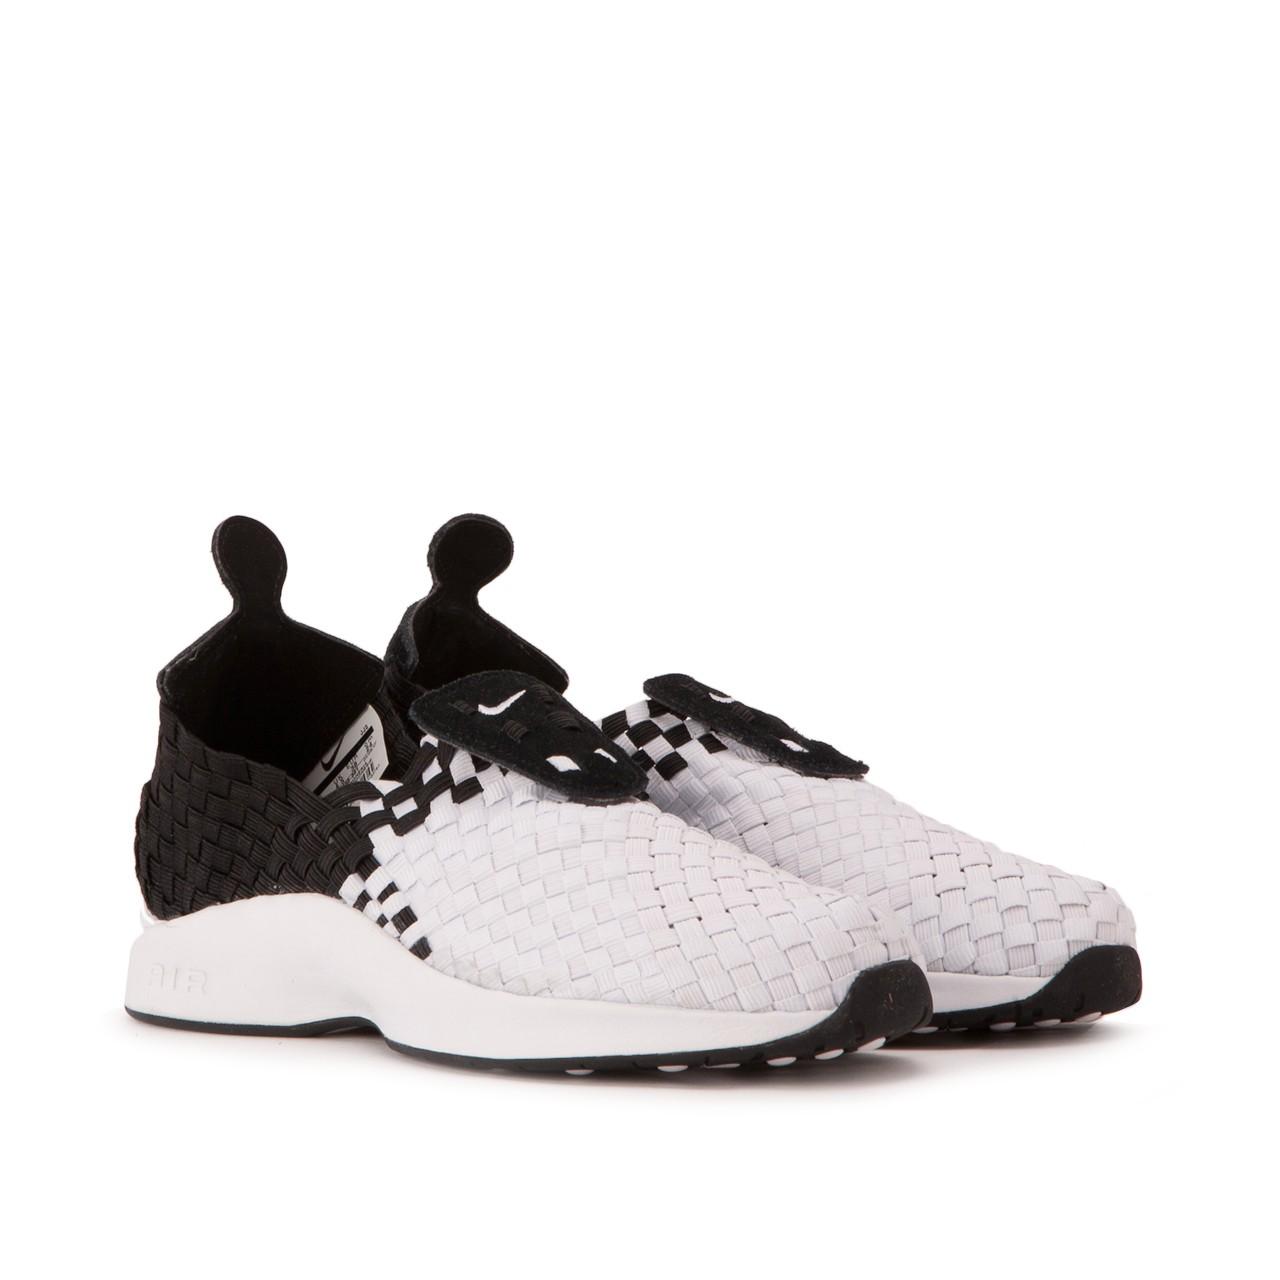 Nike Scarpe donna WMNS NIKE AIR WOVEN 302350 001